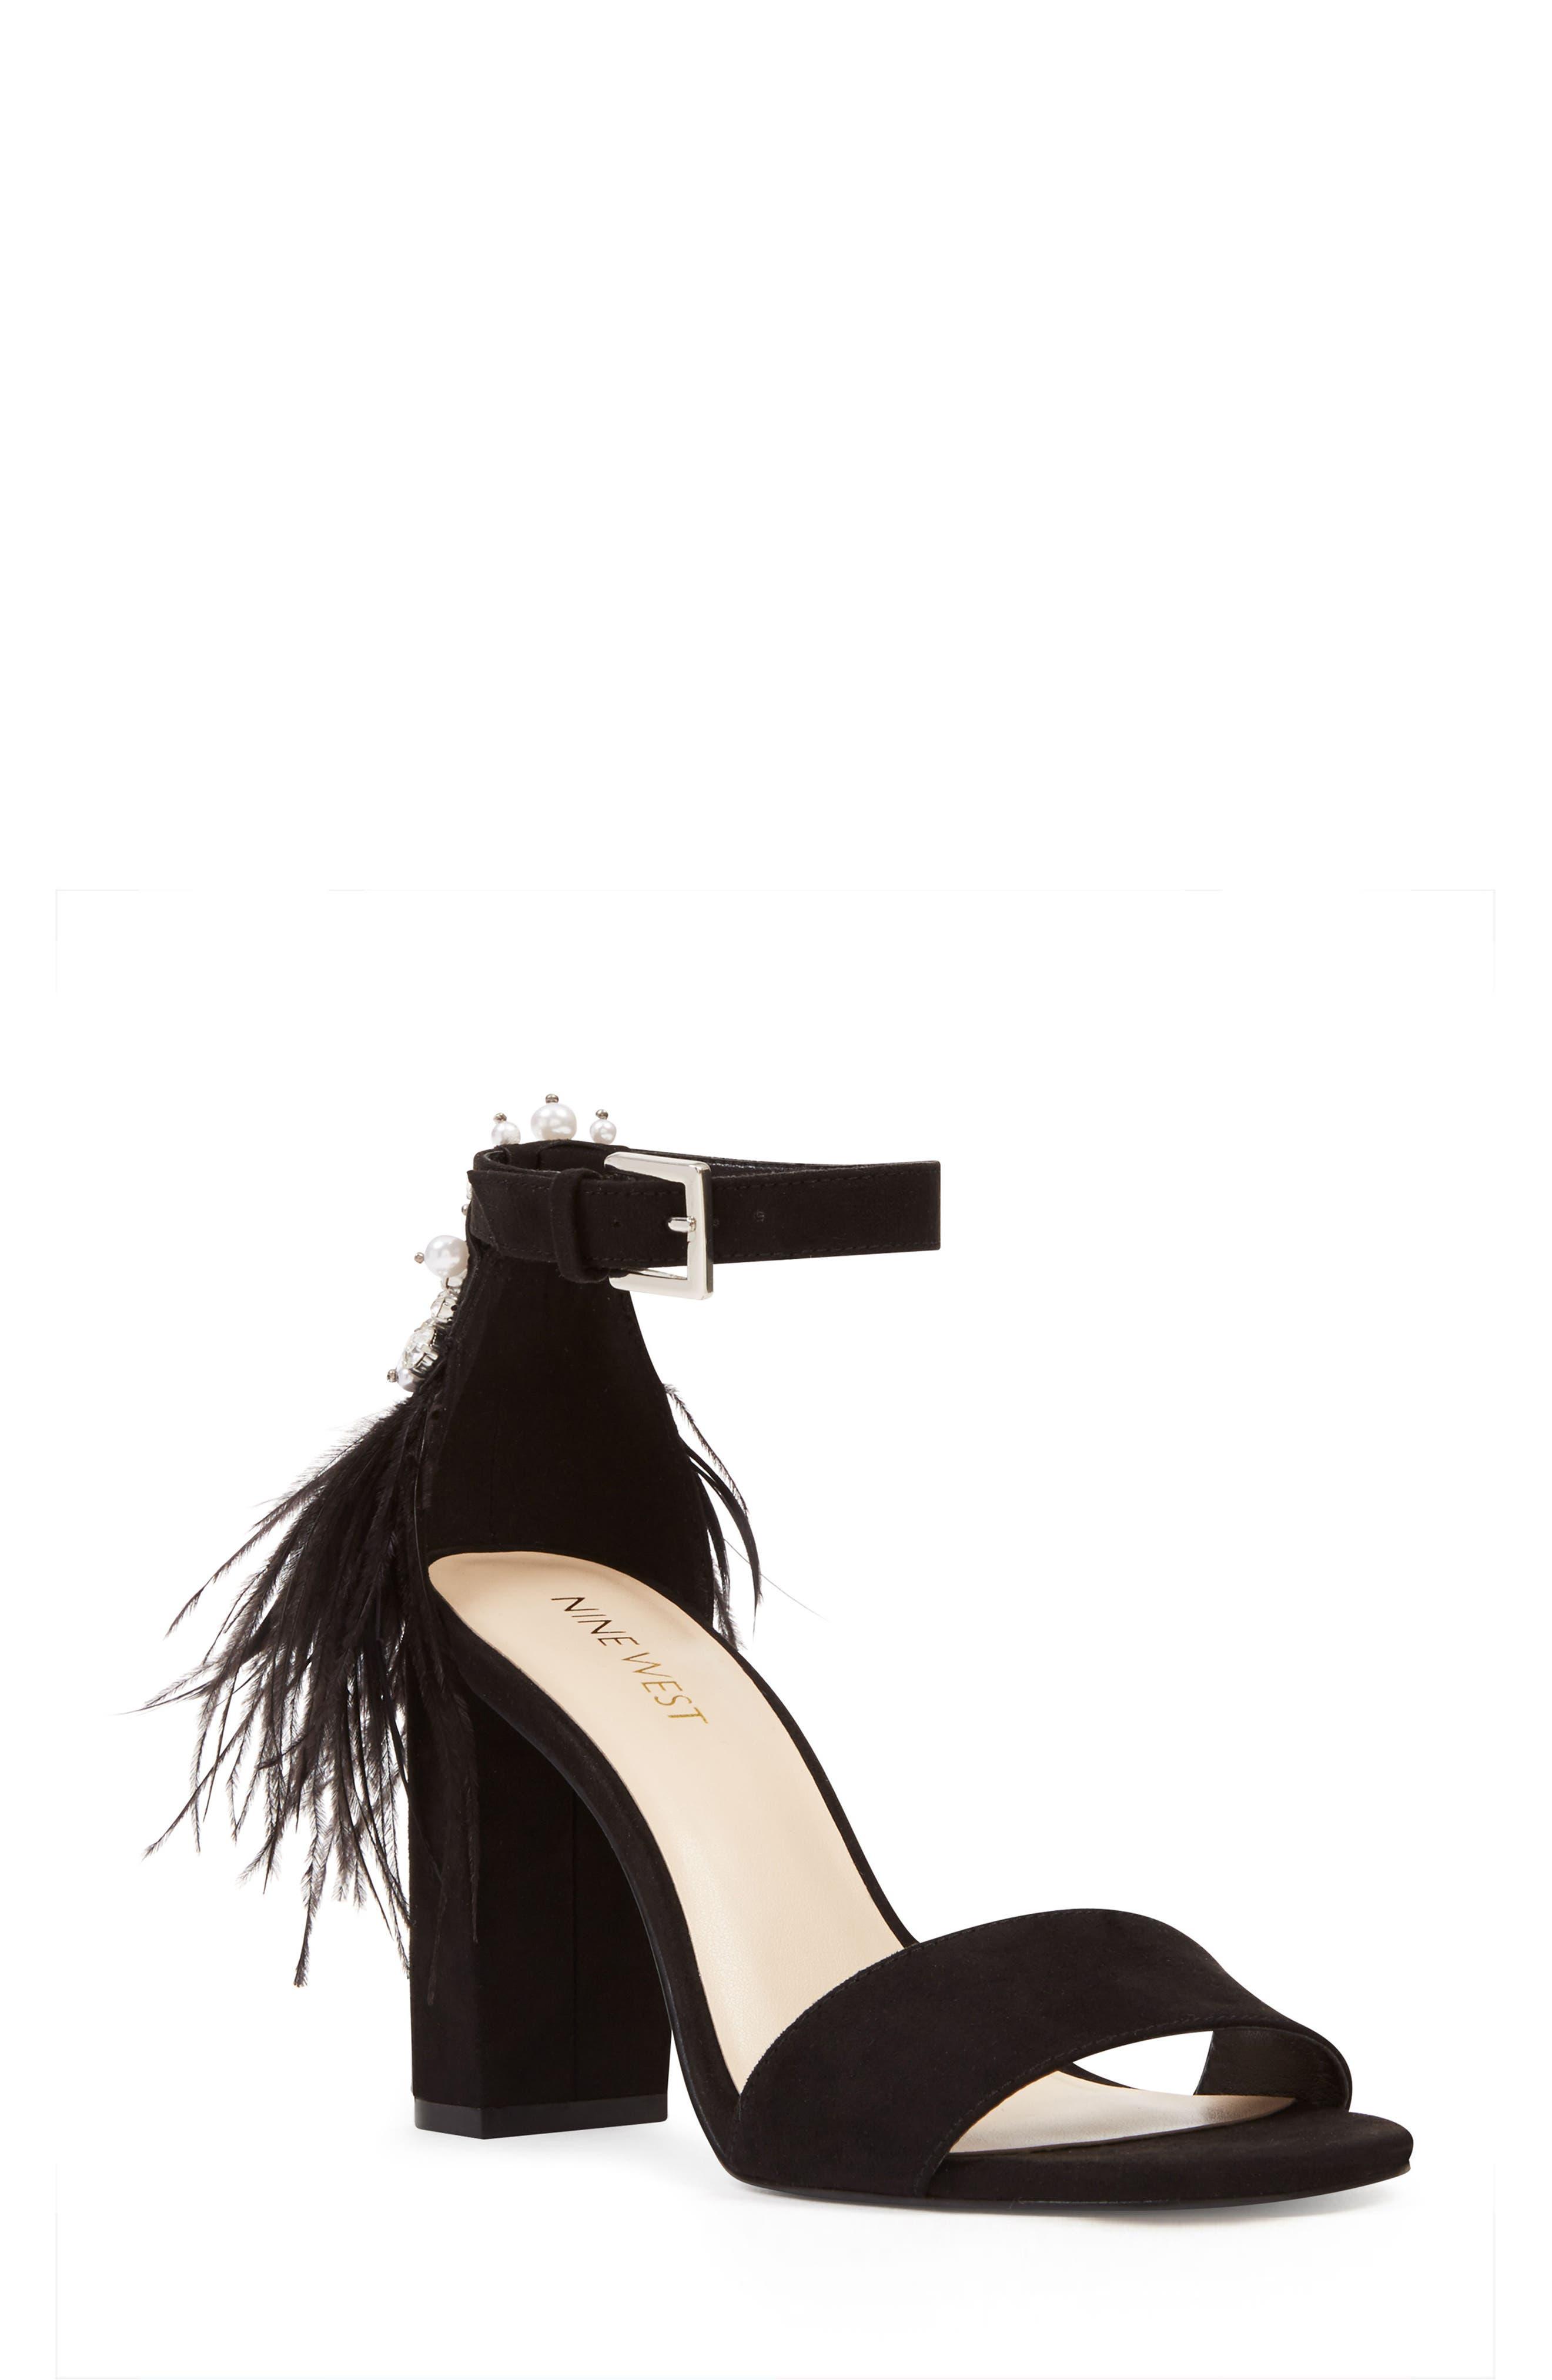 Aaronita Feather Block Heel Sandal,                         Main,                         color, 001